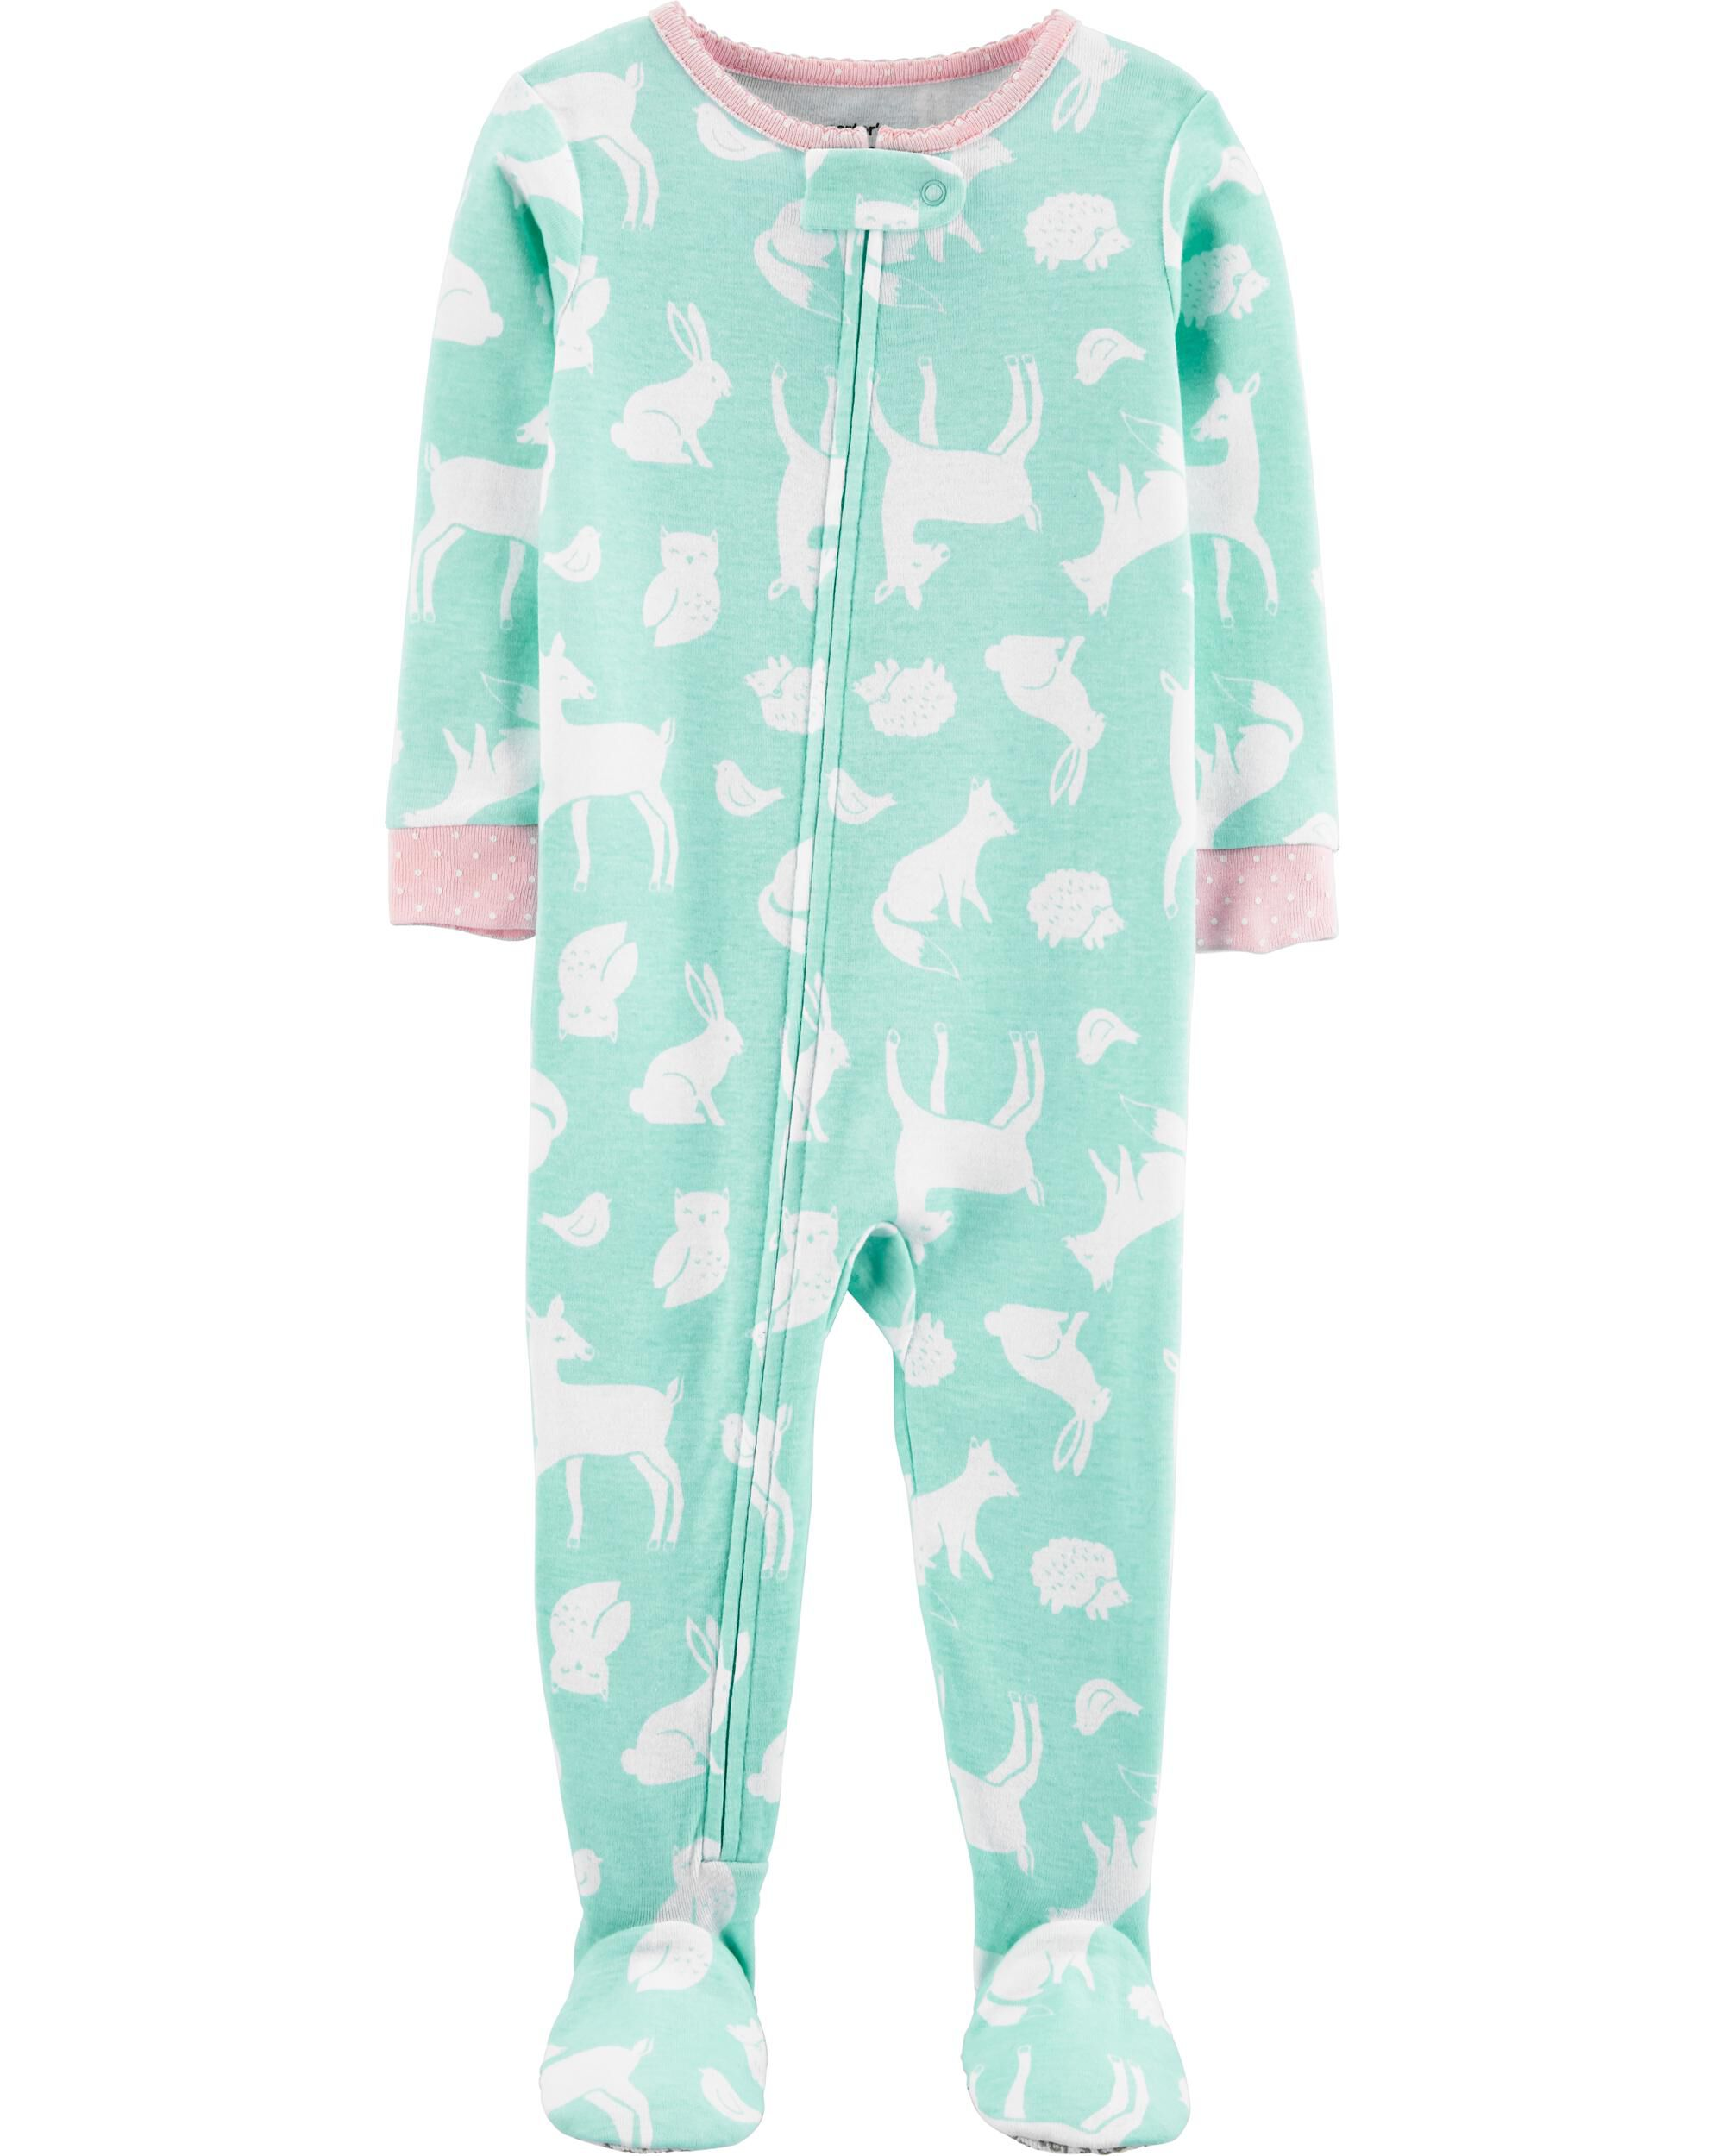 *CLEARANCE* 1-Piece Woodland Creatures Snug Fit Cotton Footie PJs